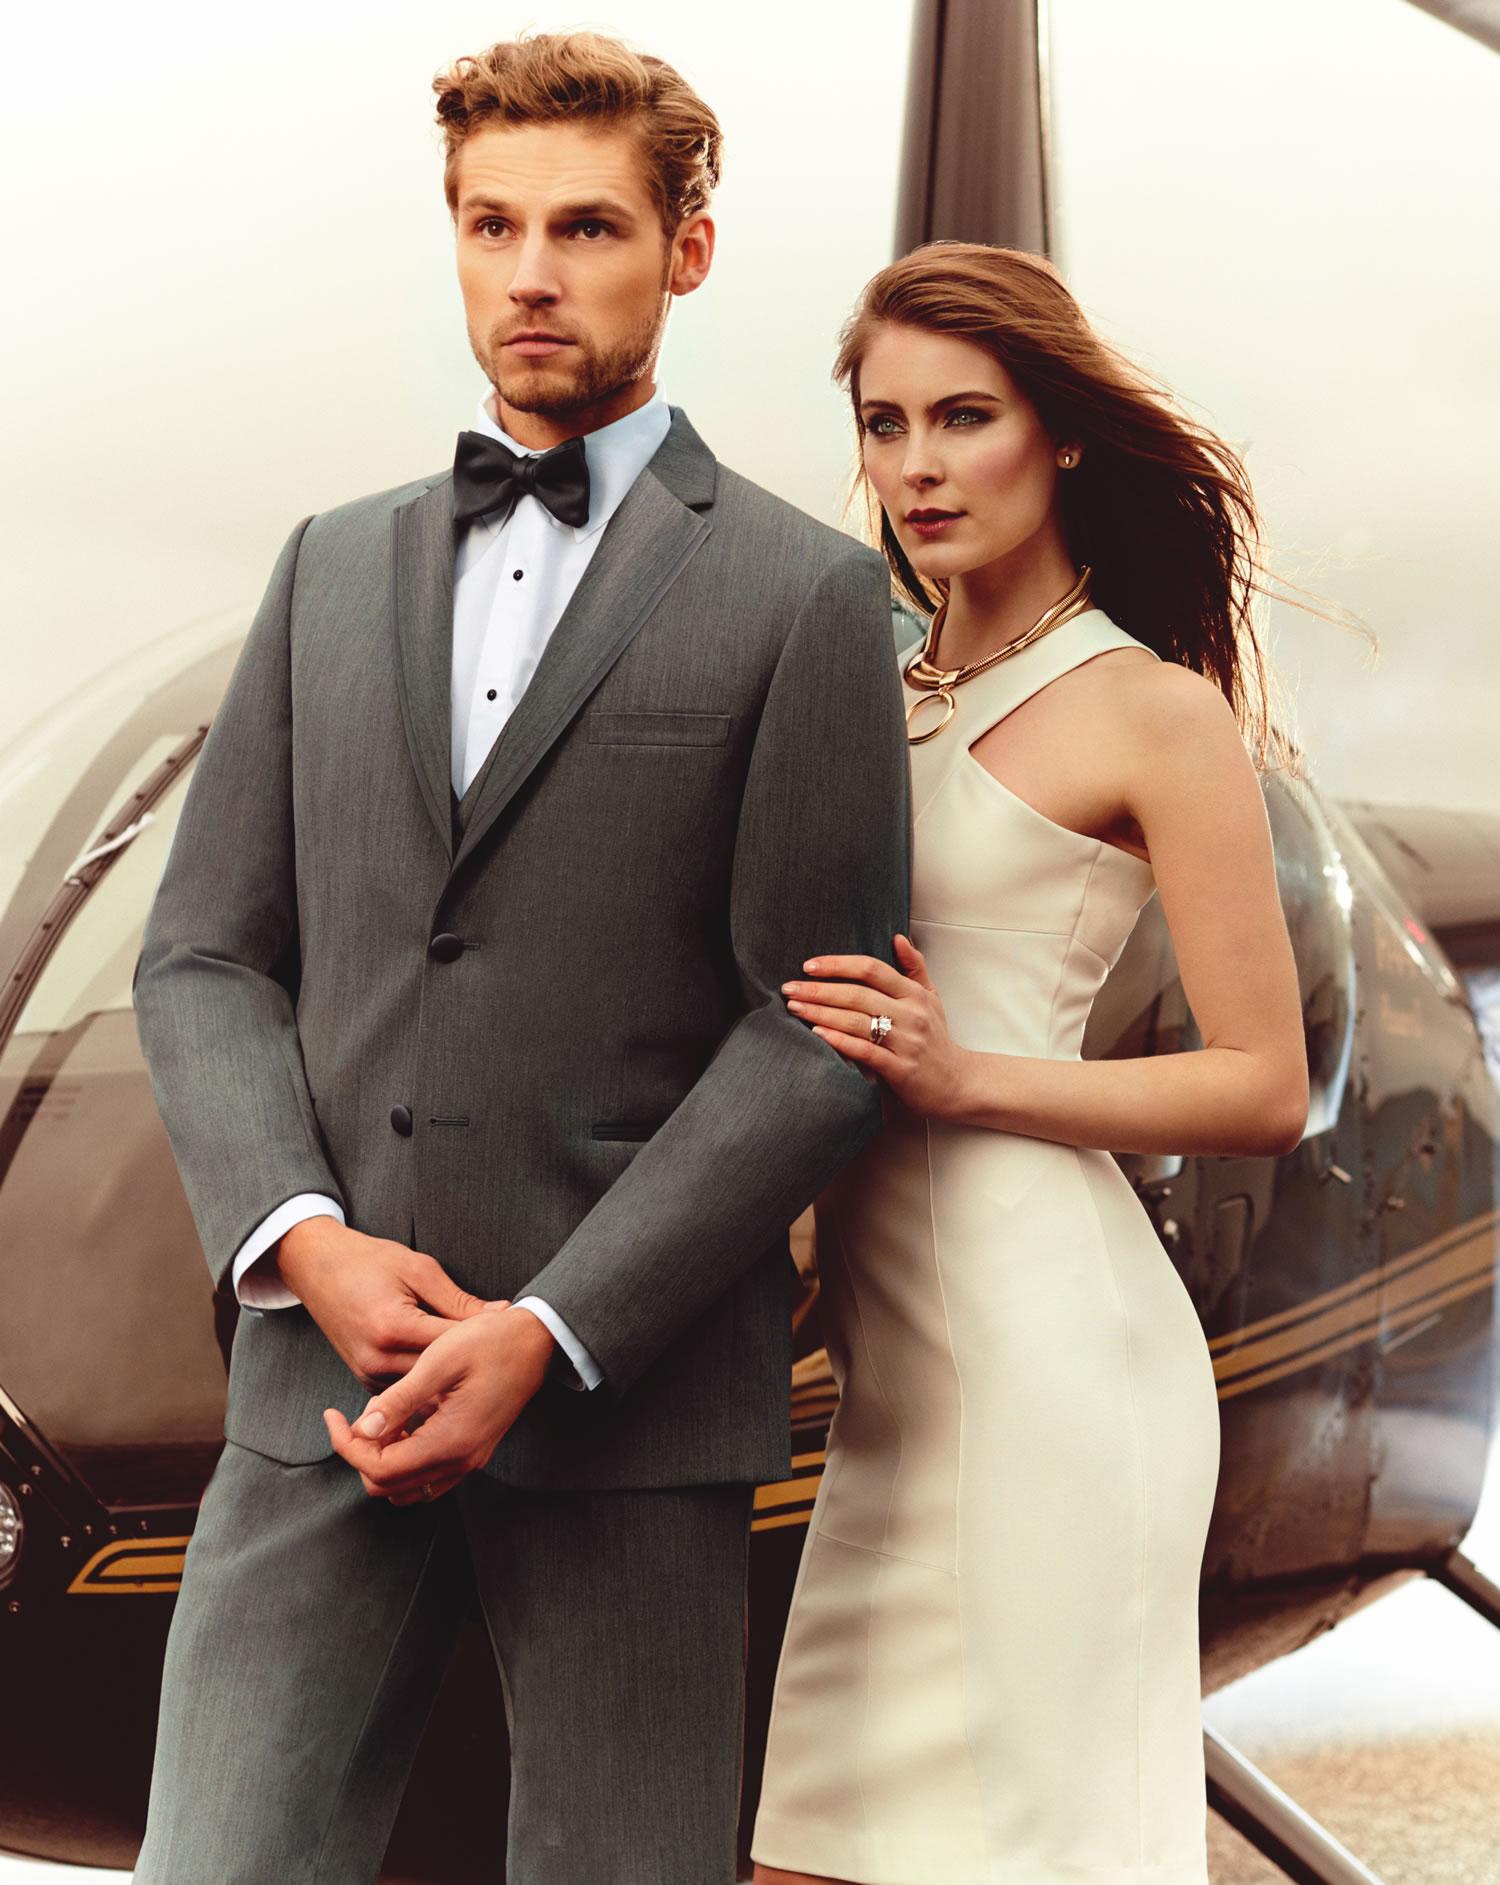 Michael Kors Grey Affection Tuxedo